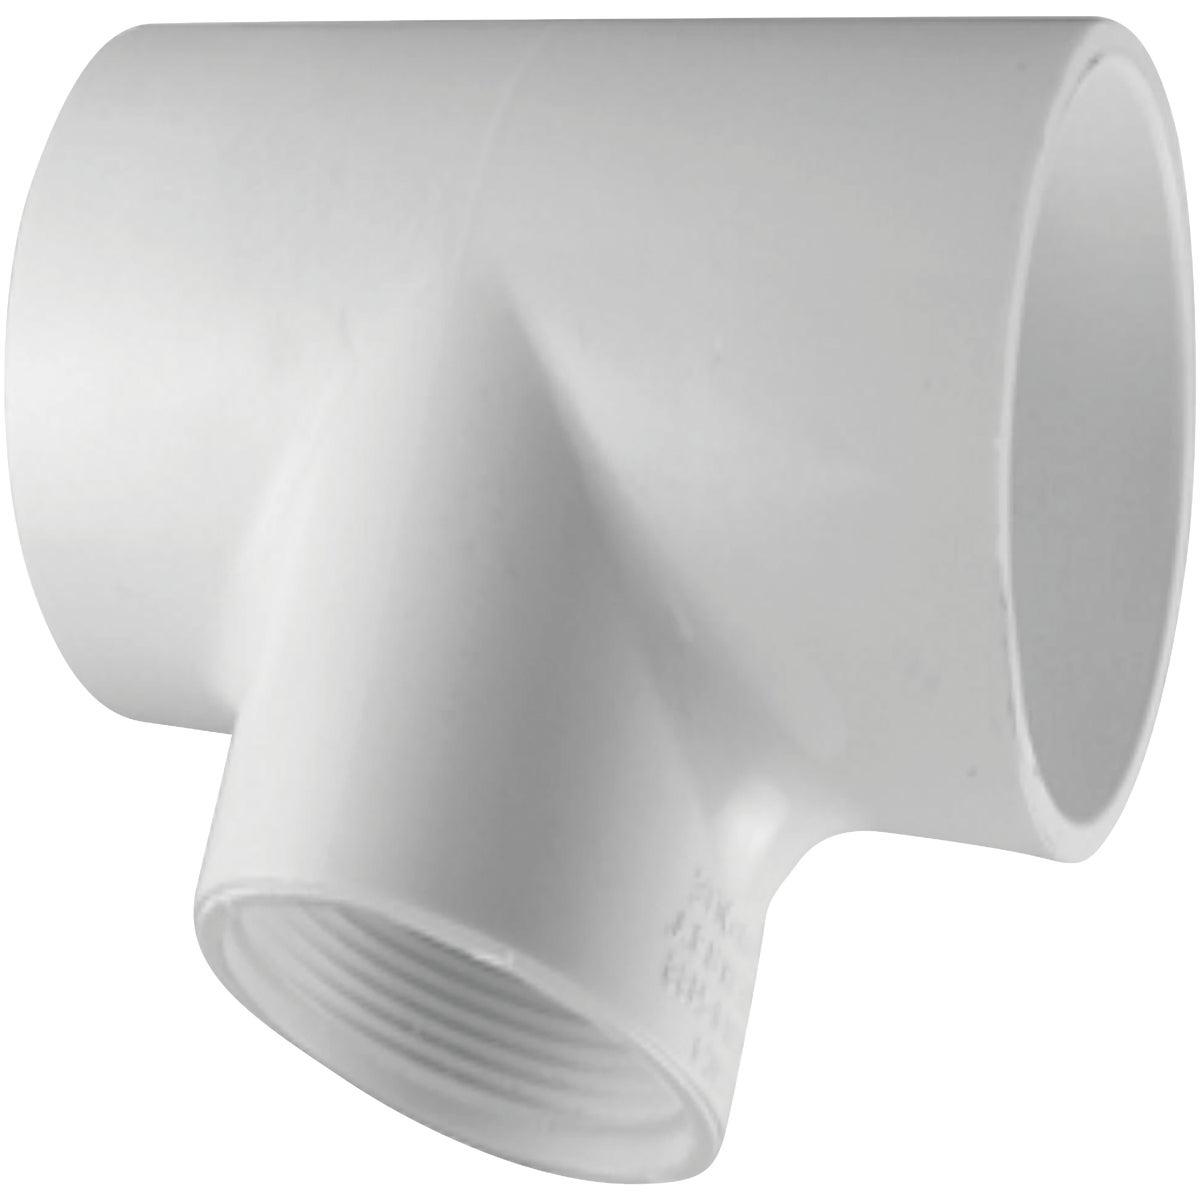 "1"" SCH40 SXFIP PVC TEE - 31458 by Genova Inc"